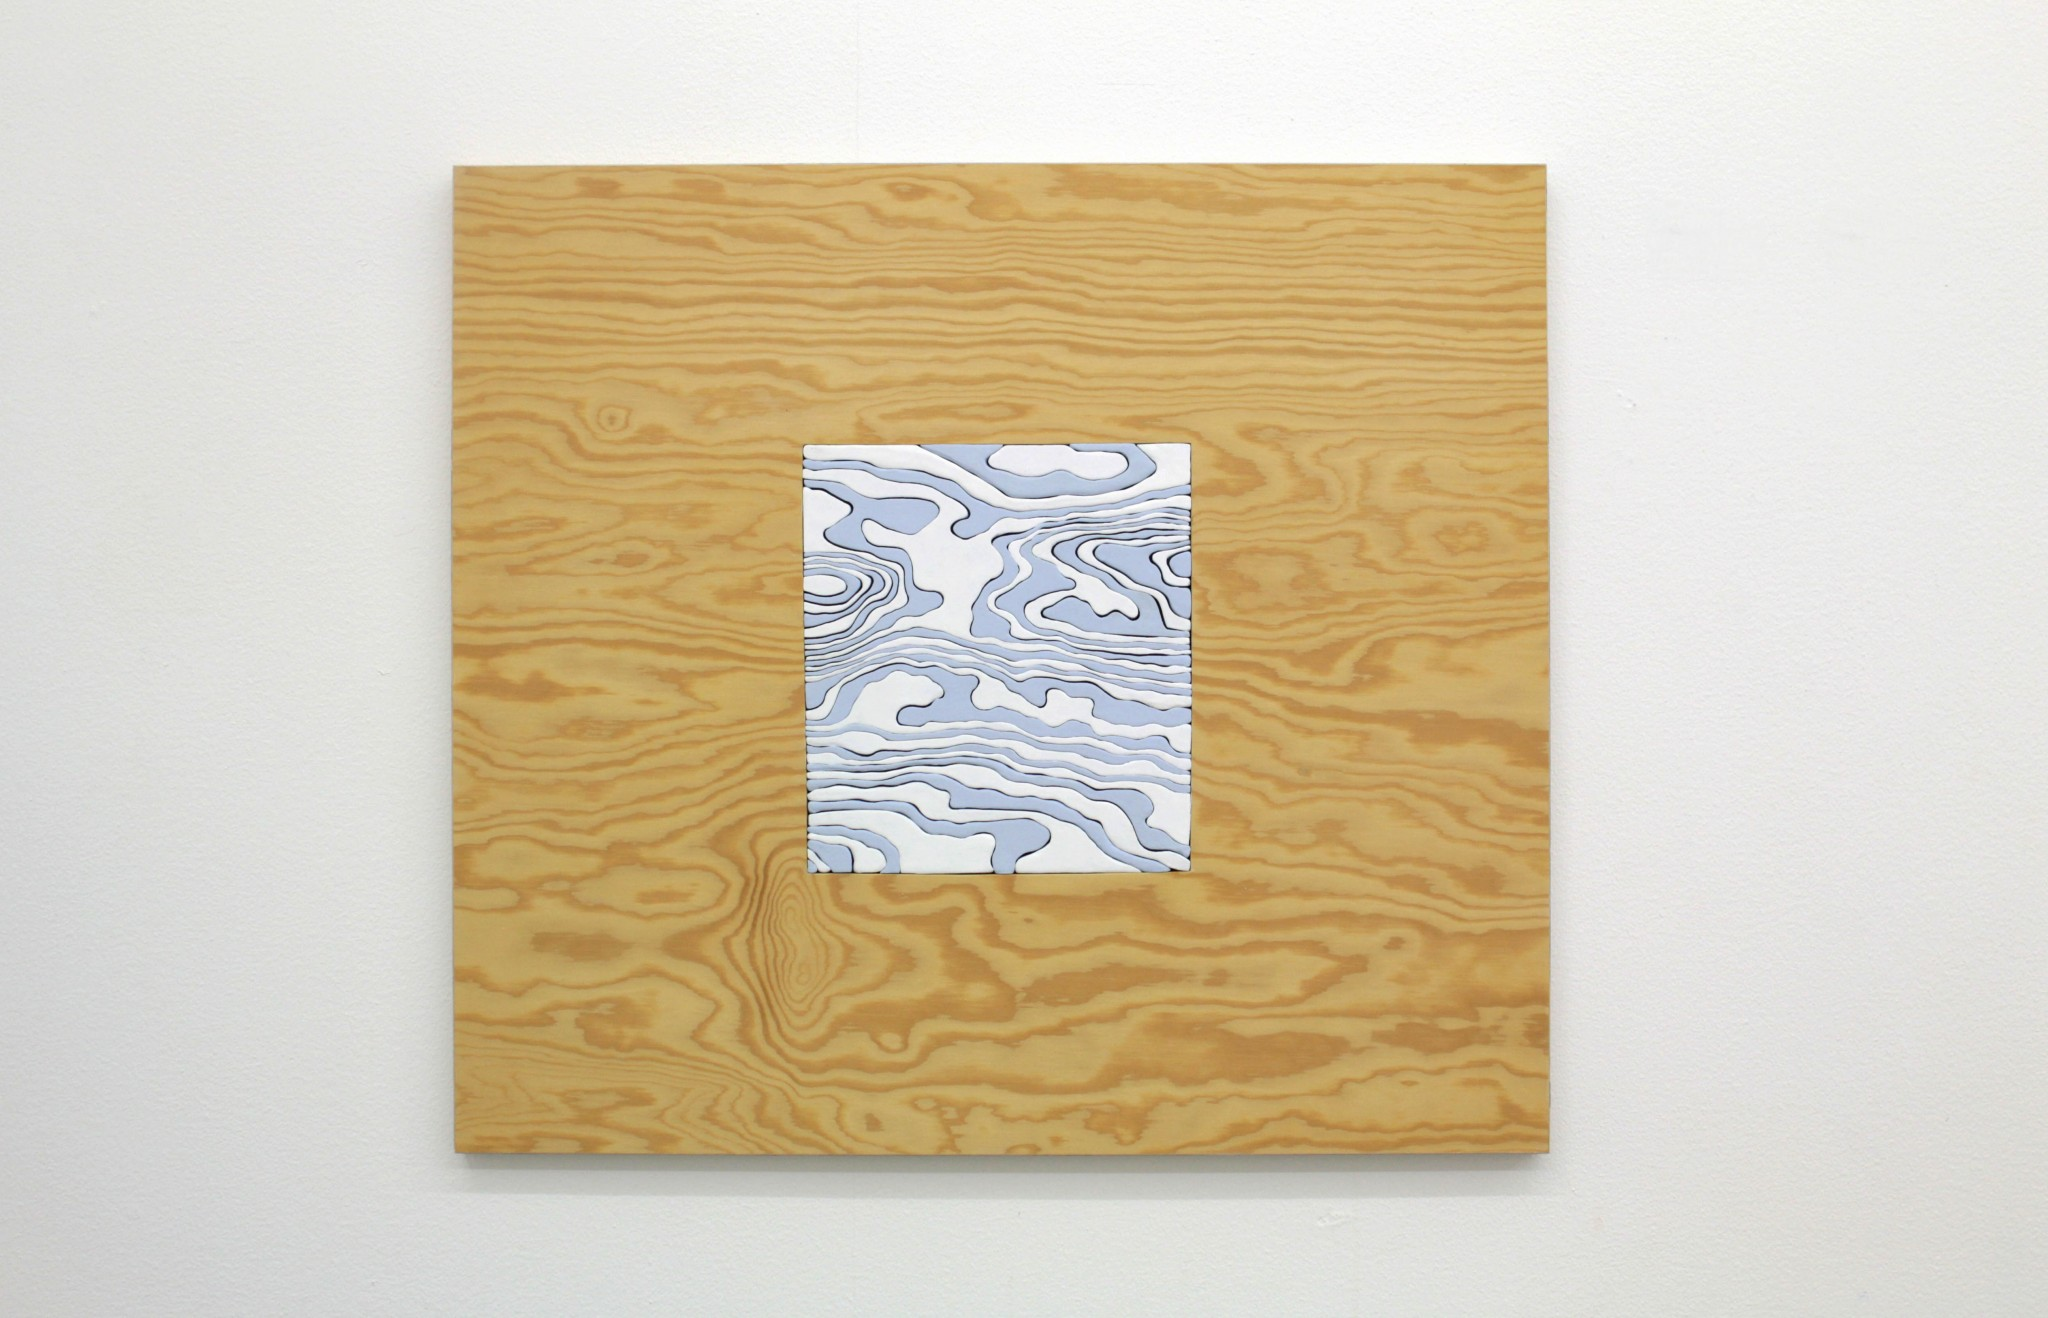 within-within-blå-60x66cm-2018-Material-vaxad-träpanel-vinylfärg